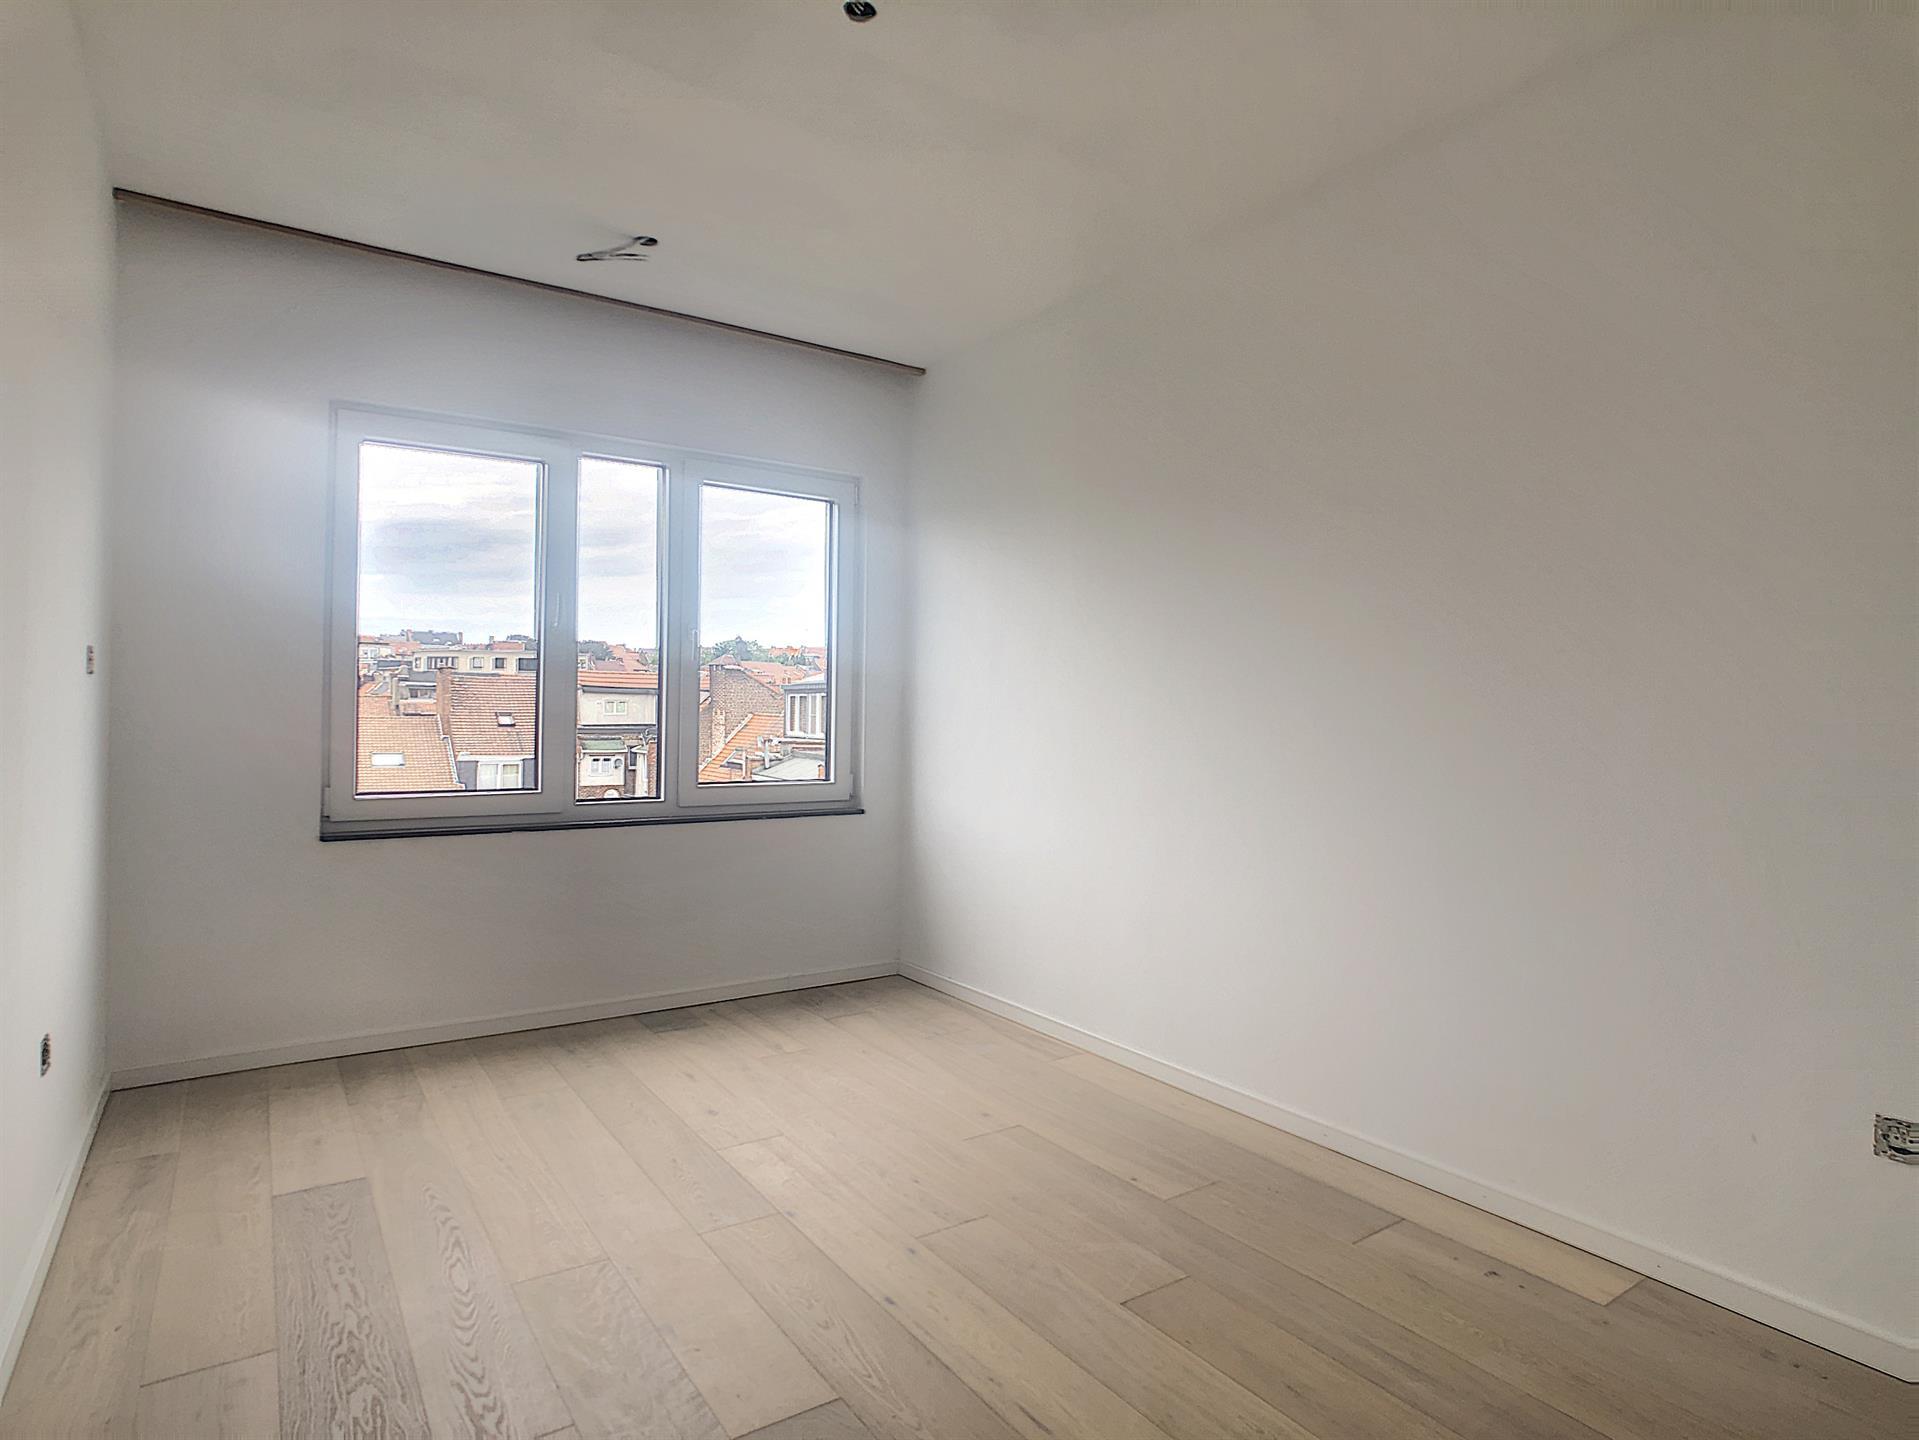 Appartement - Anderlecht - #4252388-38